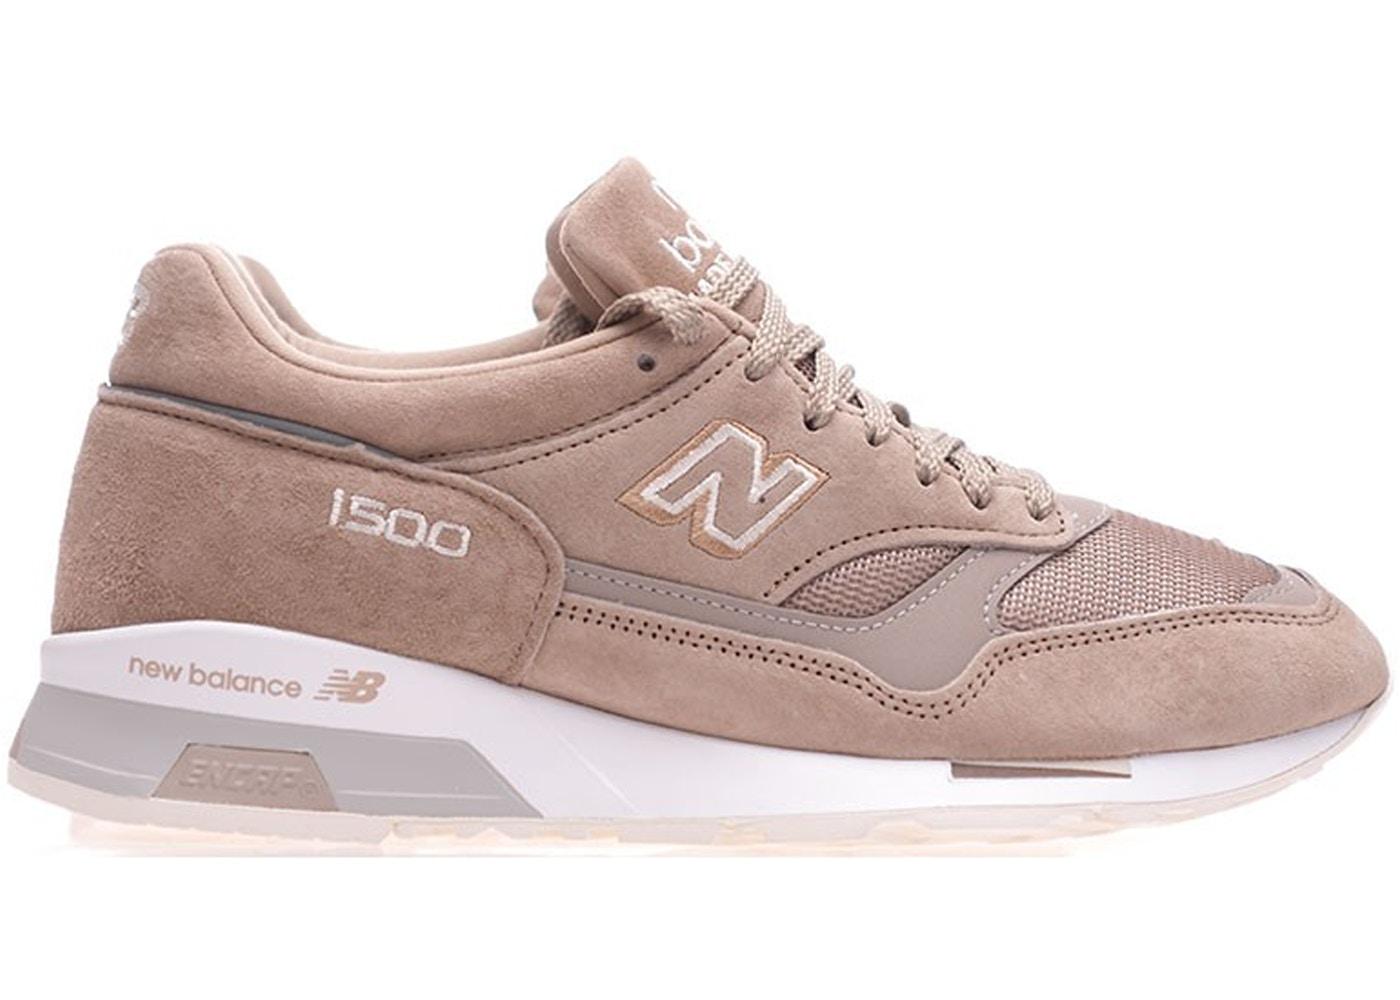 New Balance 1500 beige